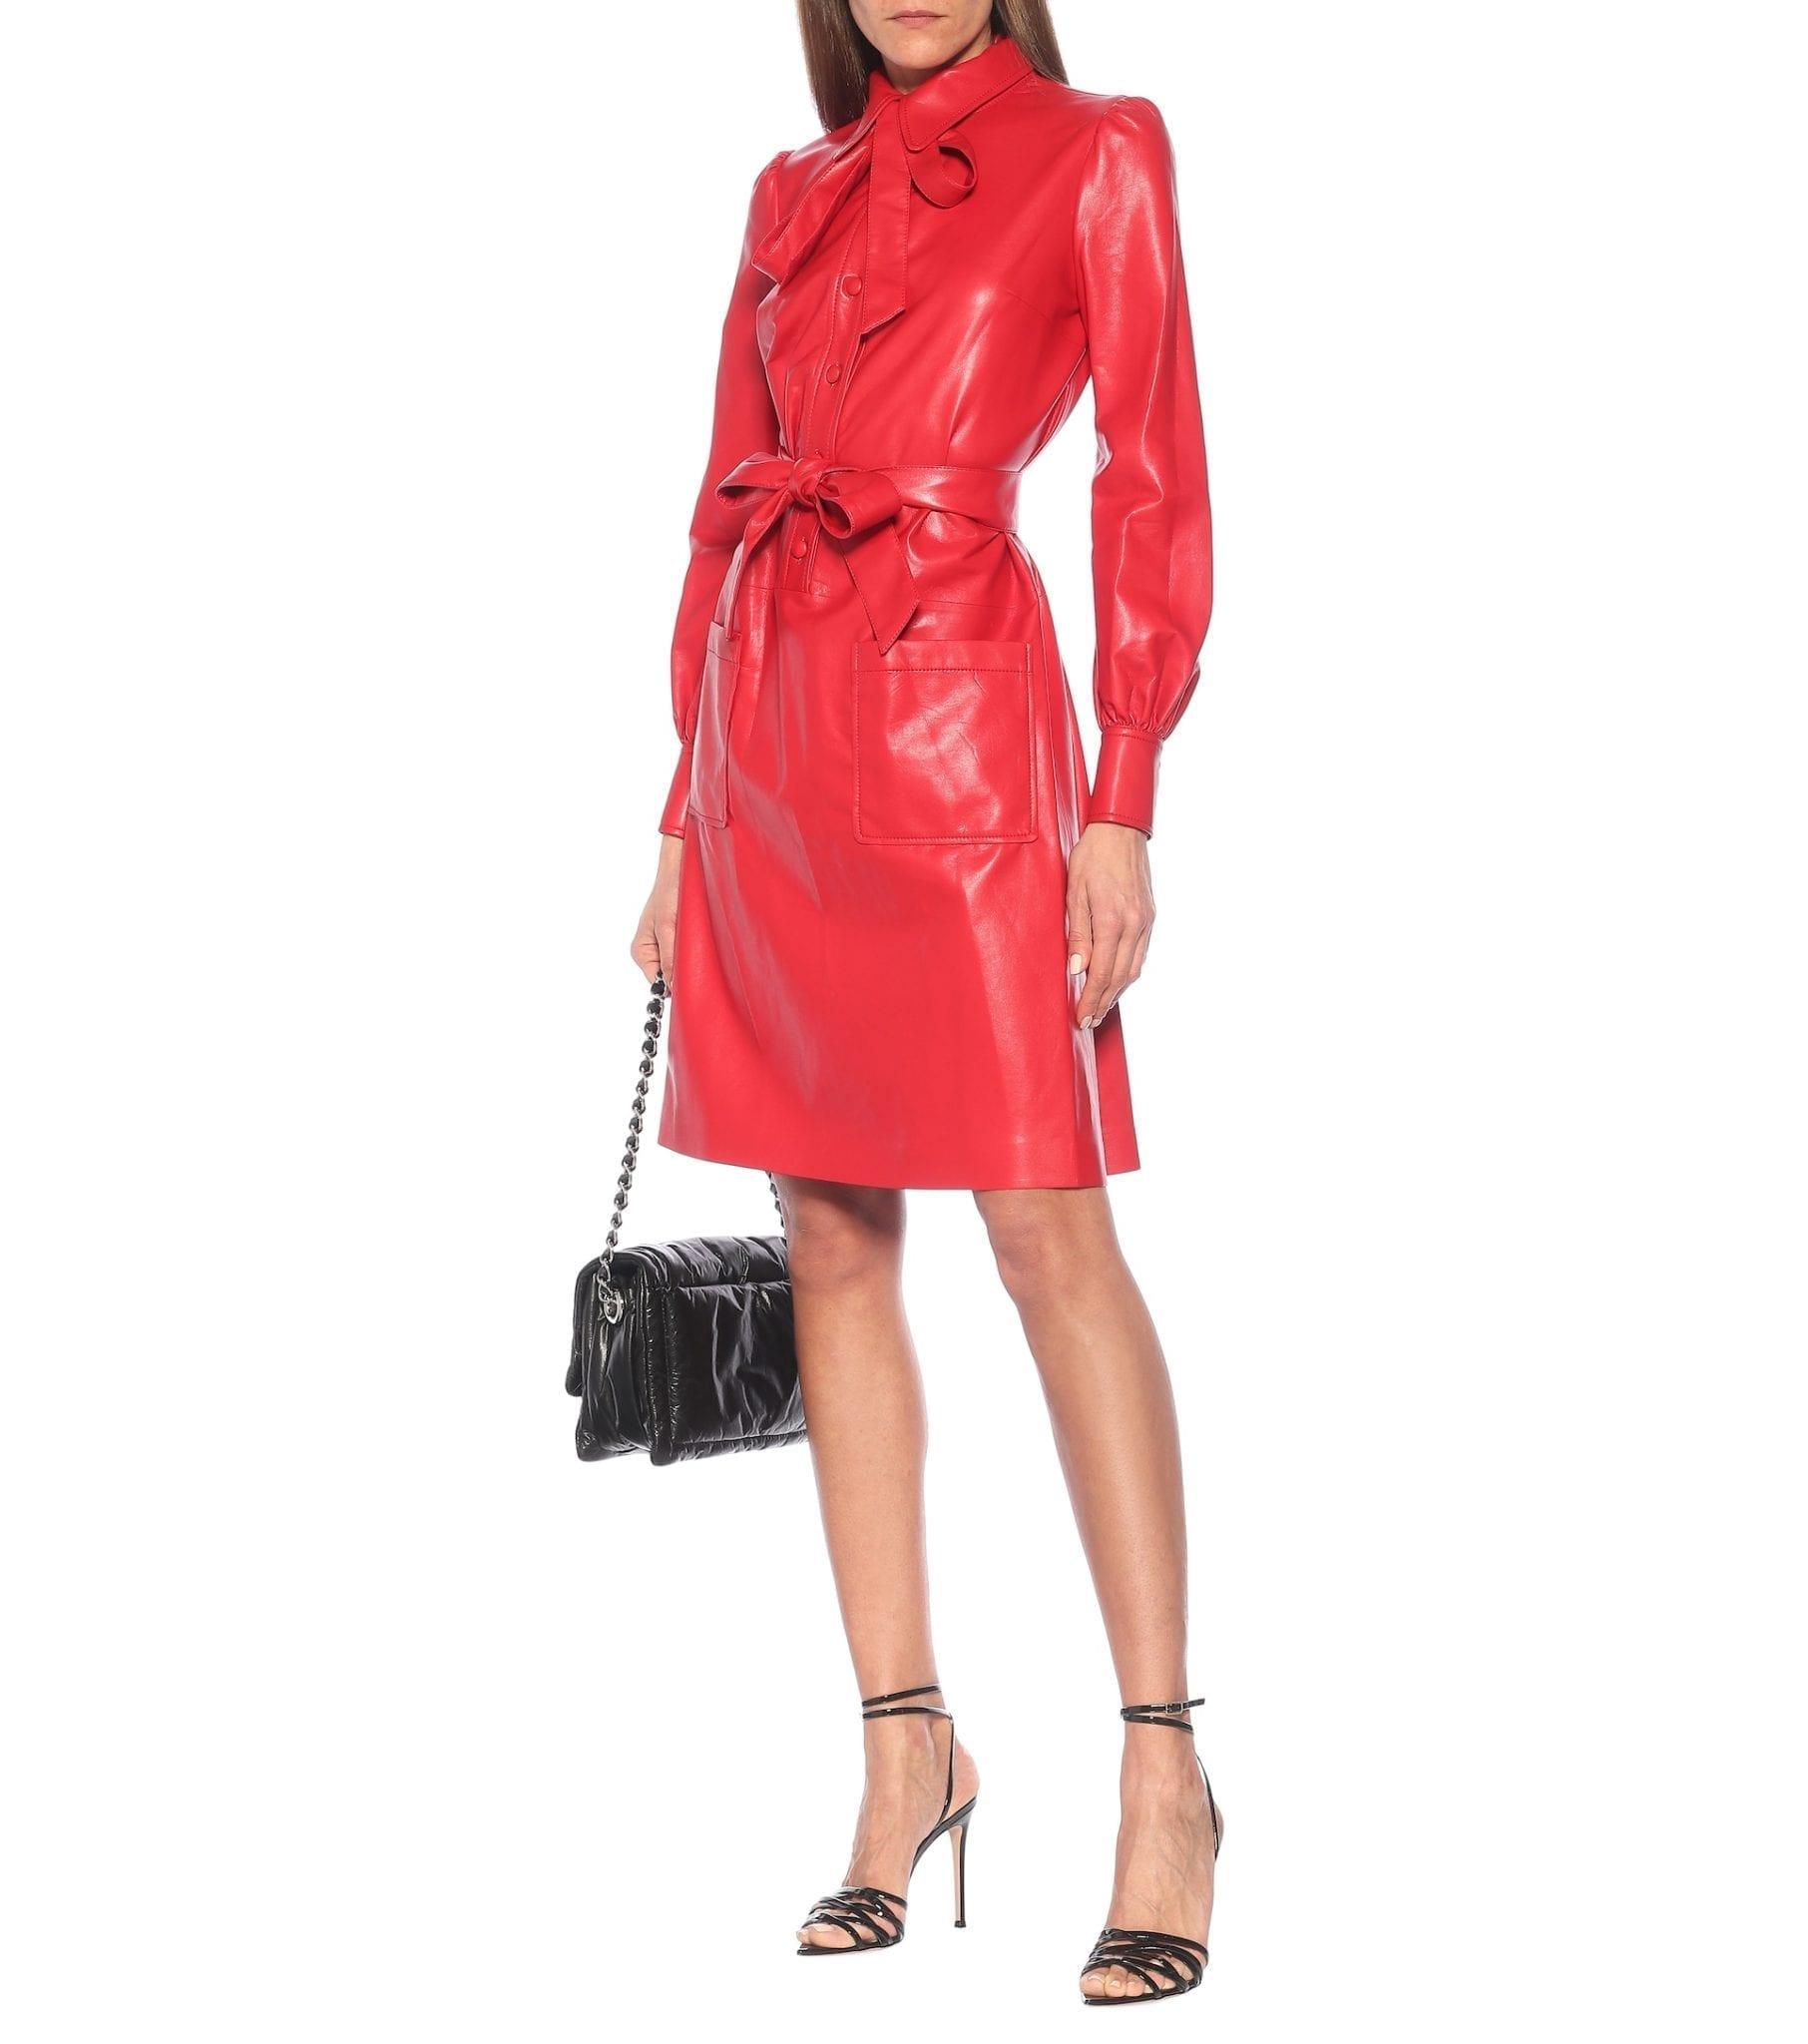 MARC JACOBS The Leatherette Faux Leather Shirt Mini Dress